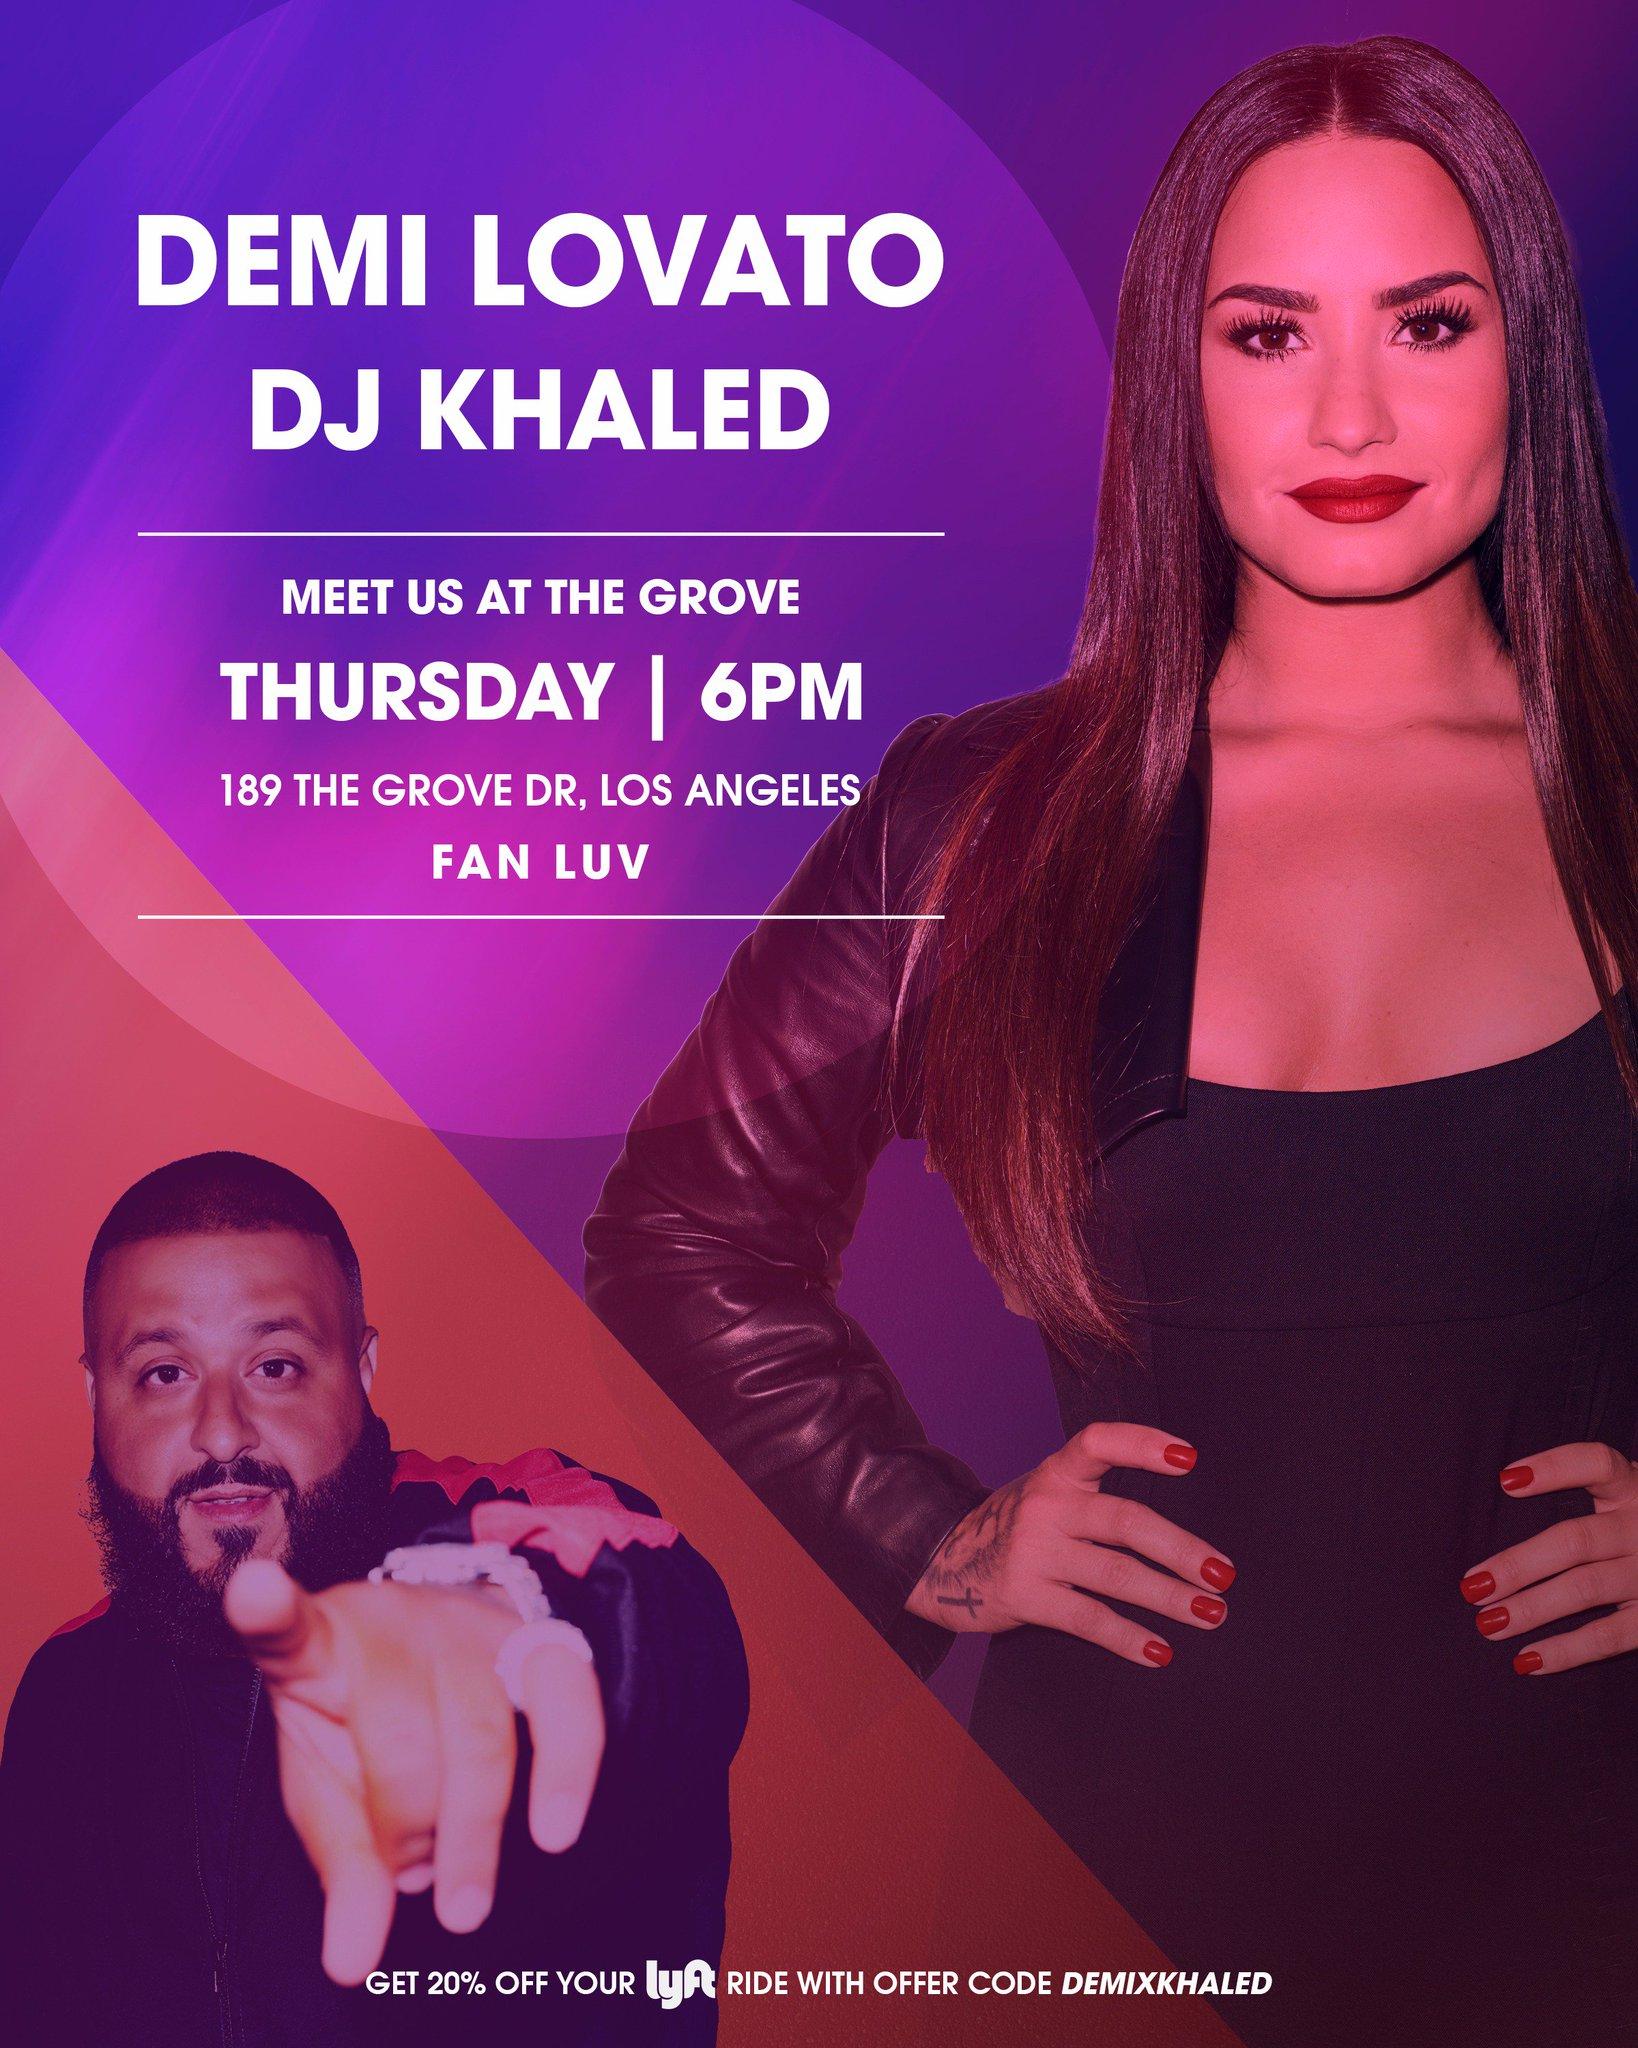 LA!! See you at @thegrovela on Thursday? ����������@djkhaled https://t.co/c7ssoFK9L9